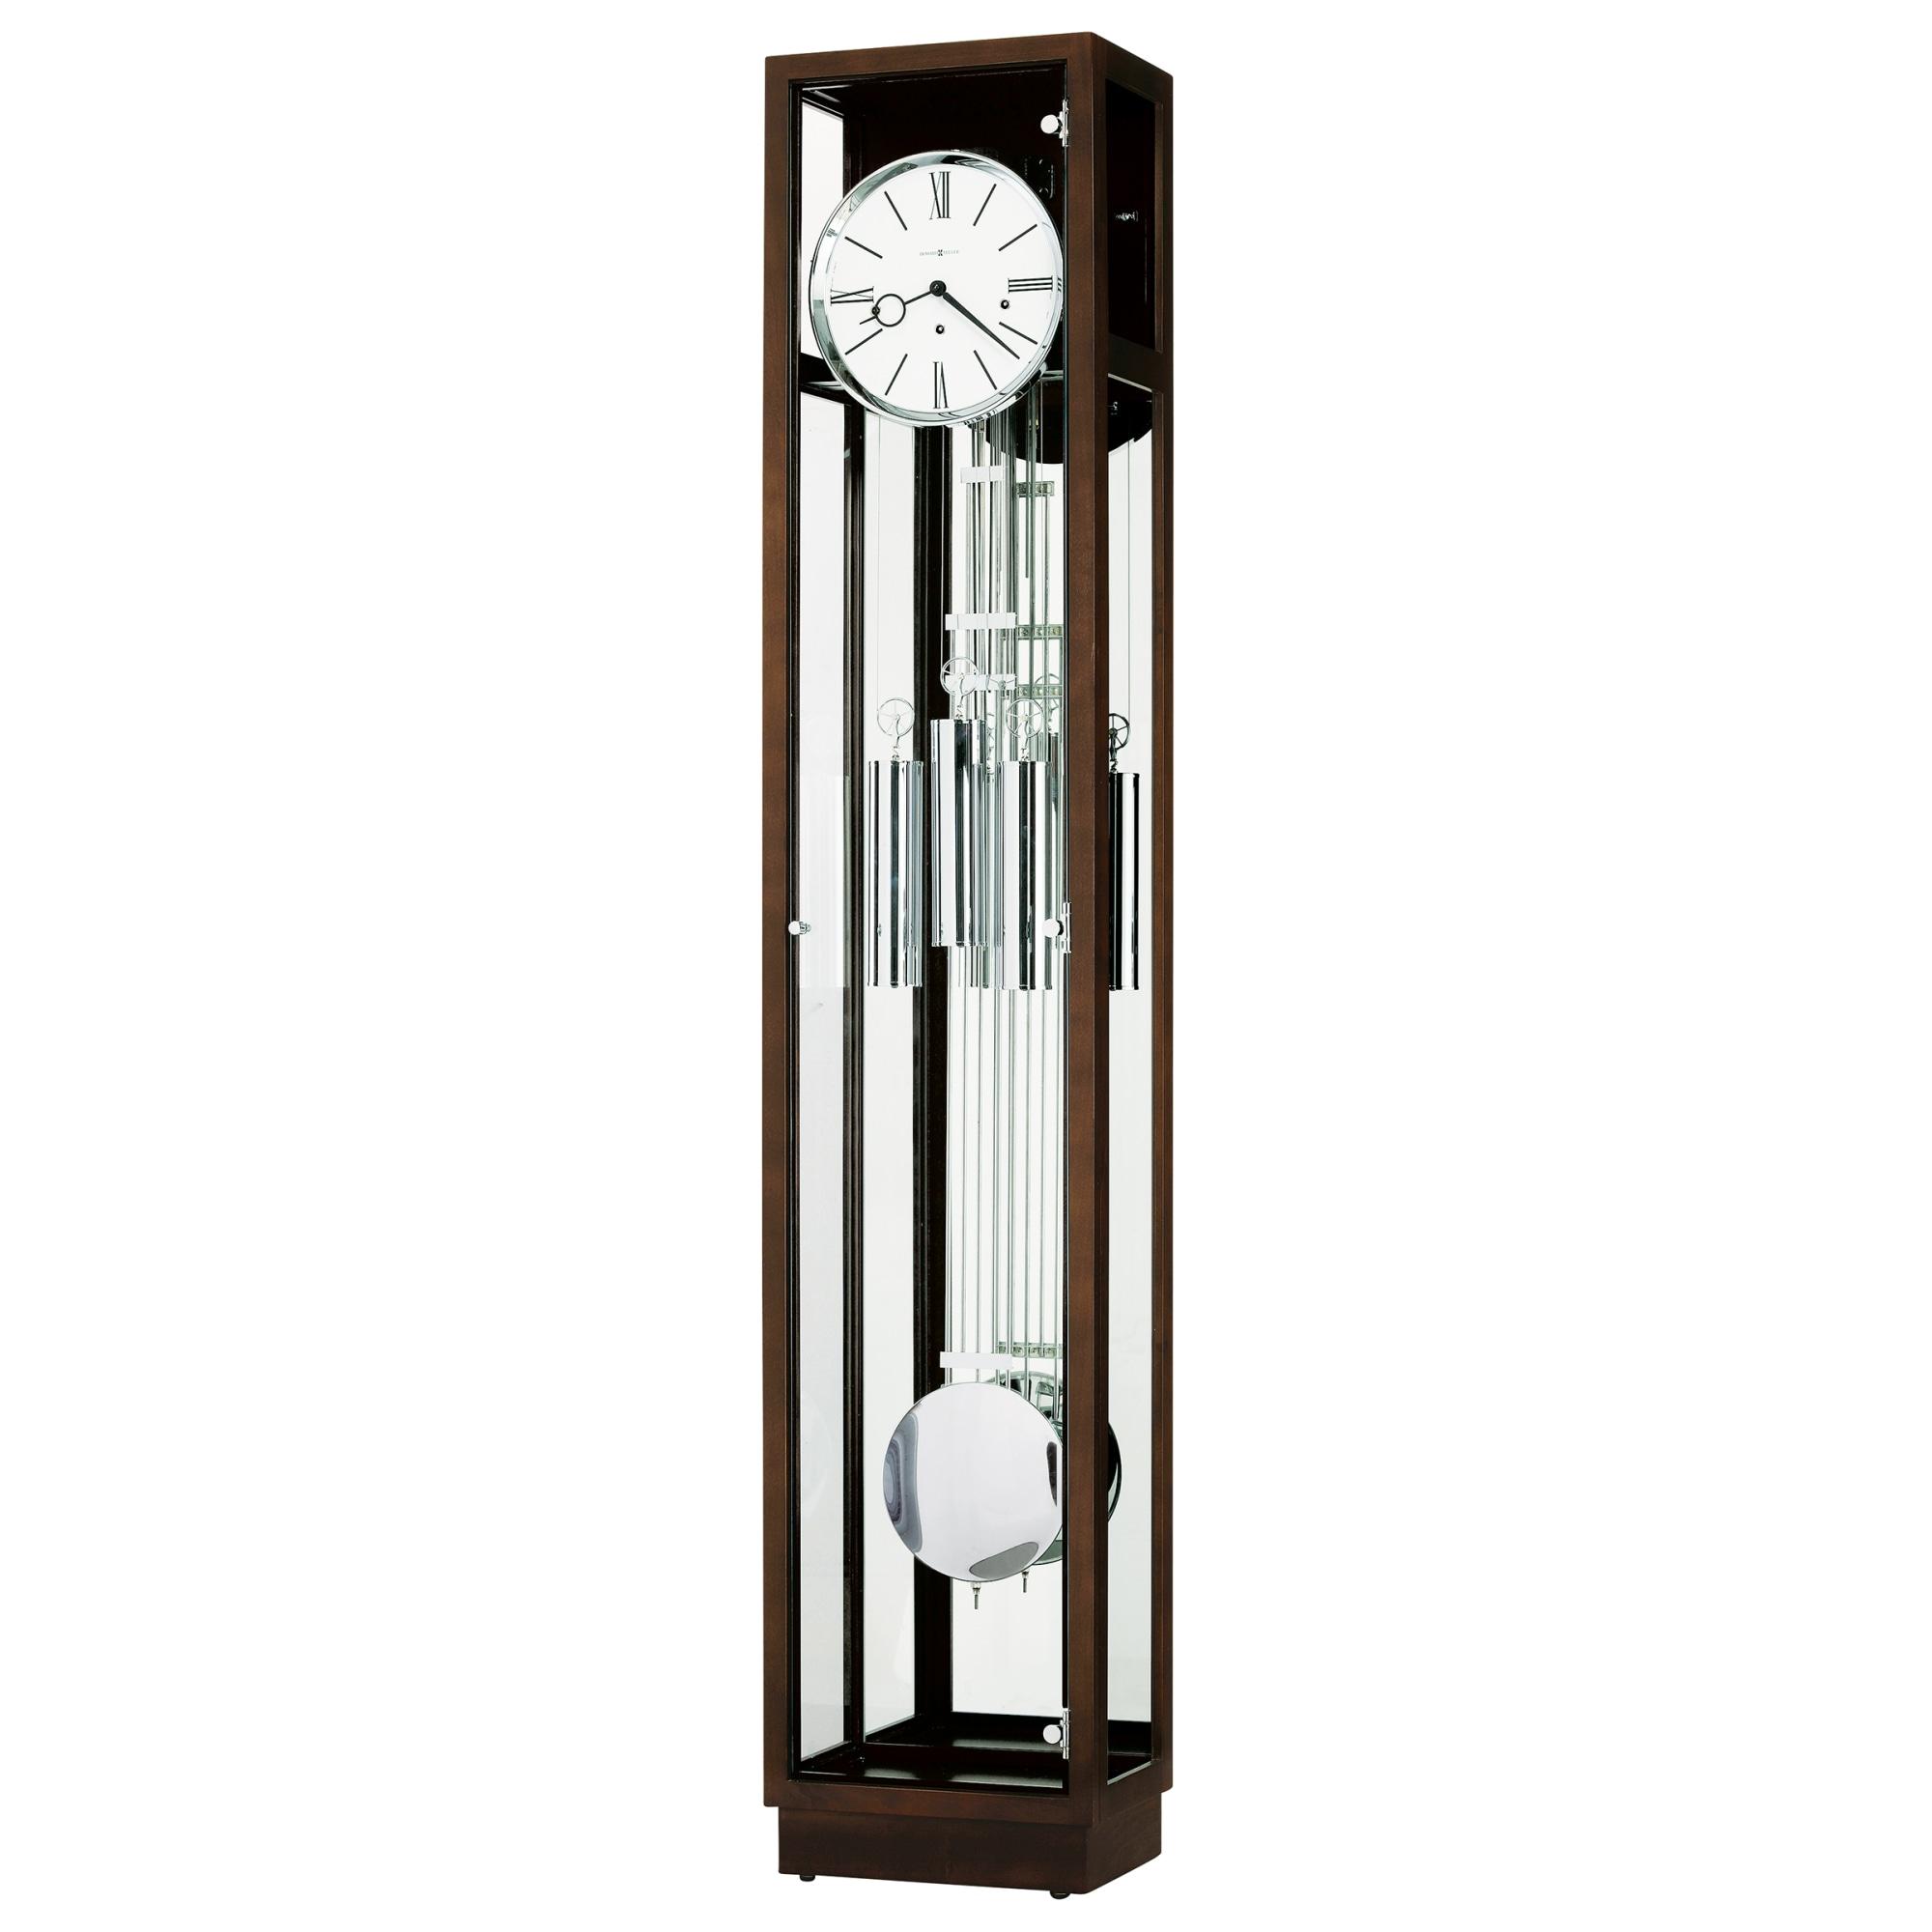 Image for Howard Miller Brenner Wooden Floor Clock 611290 from Howard Miller Official Website